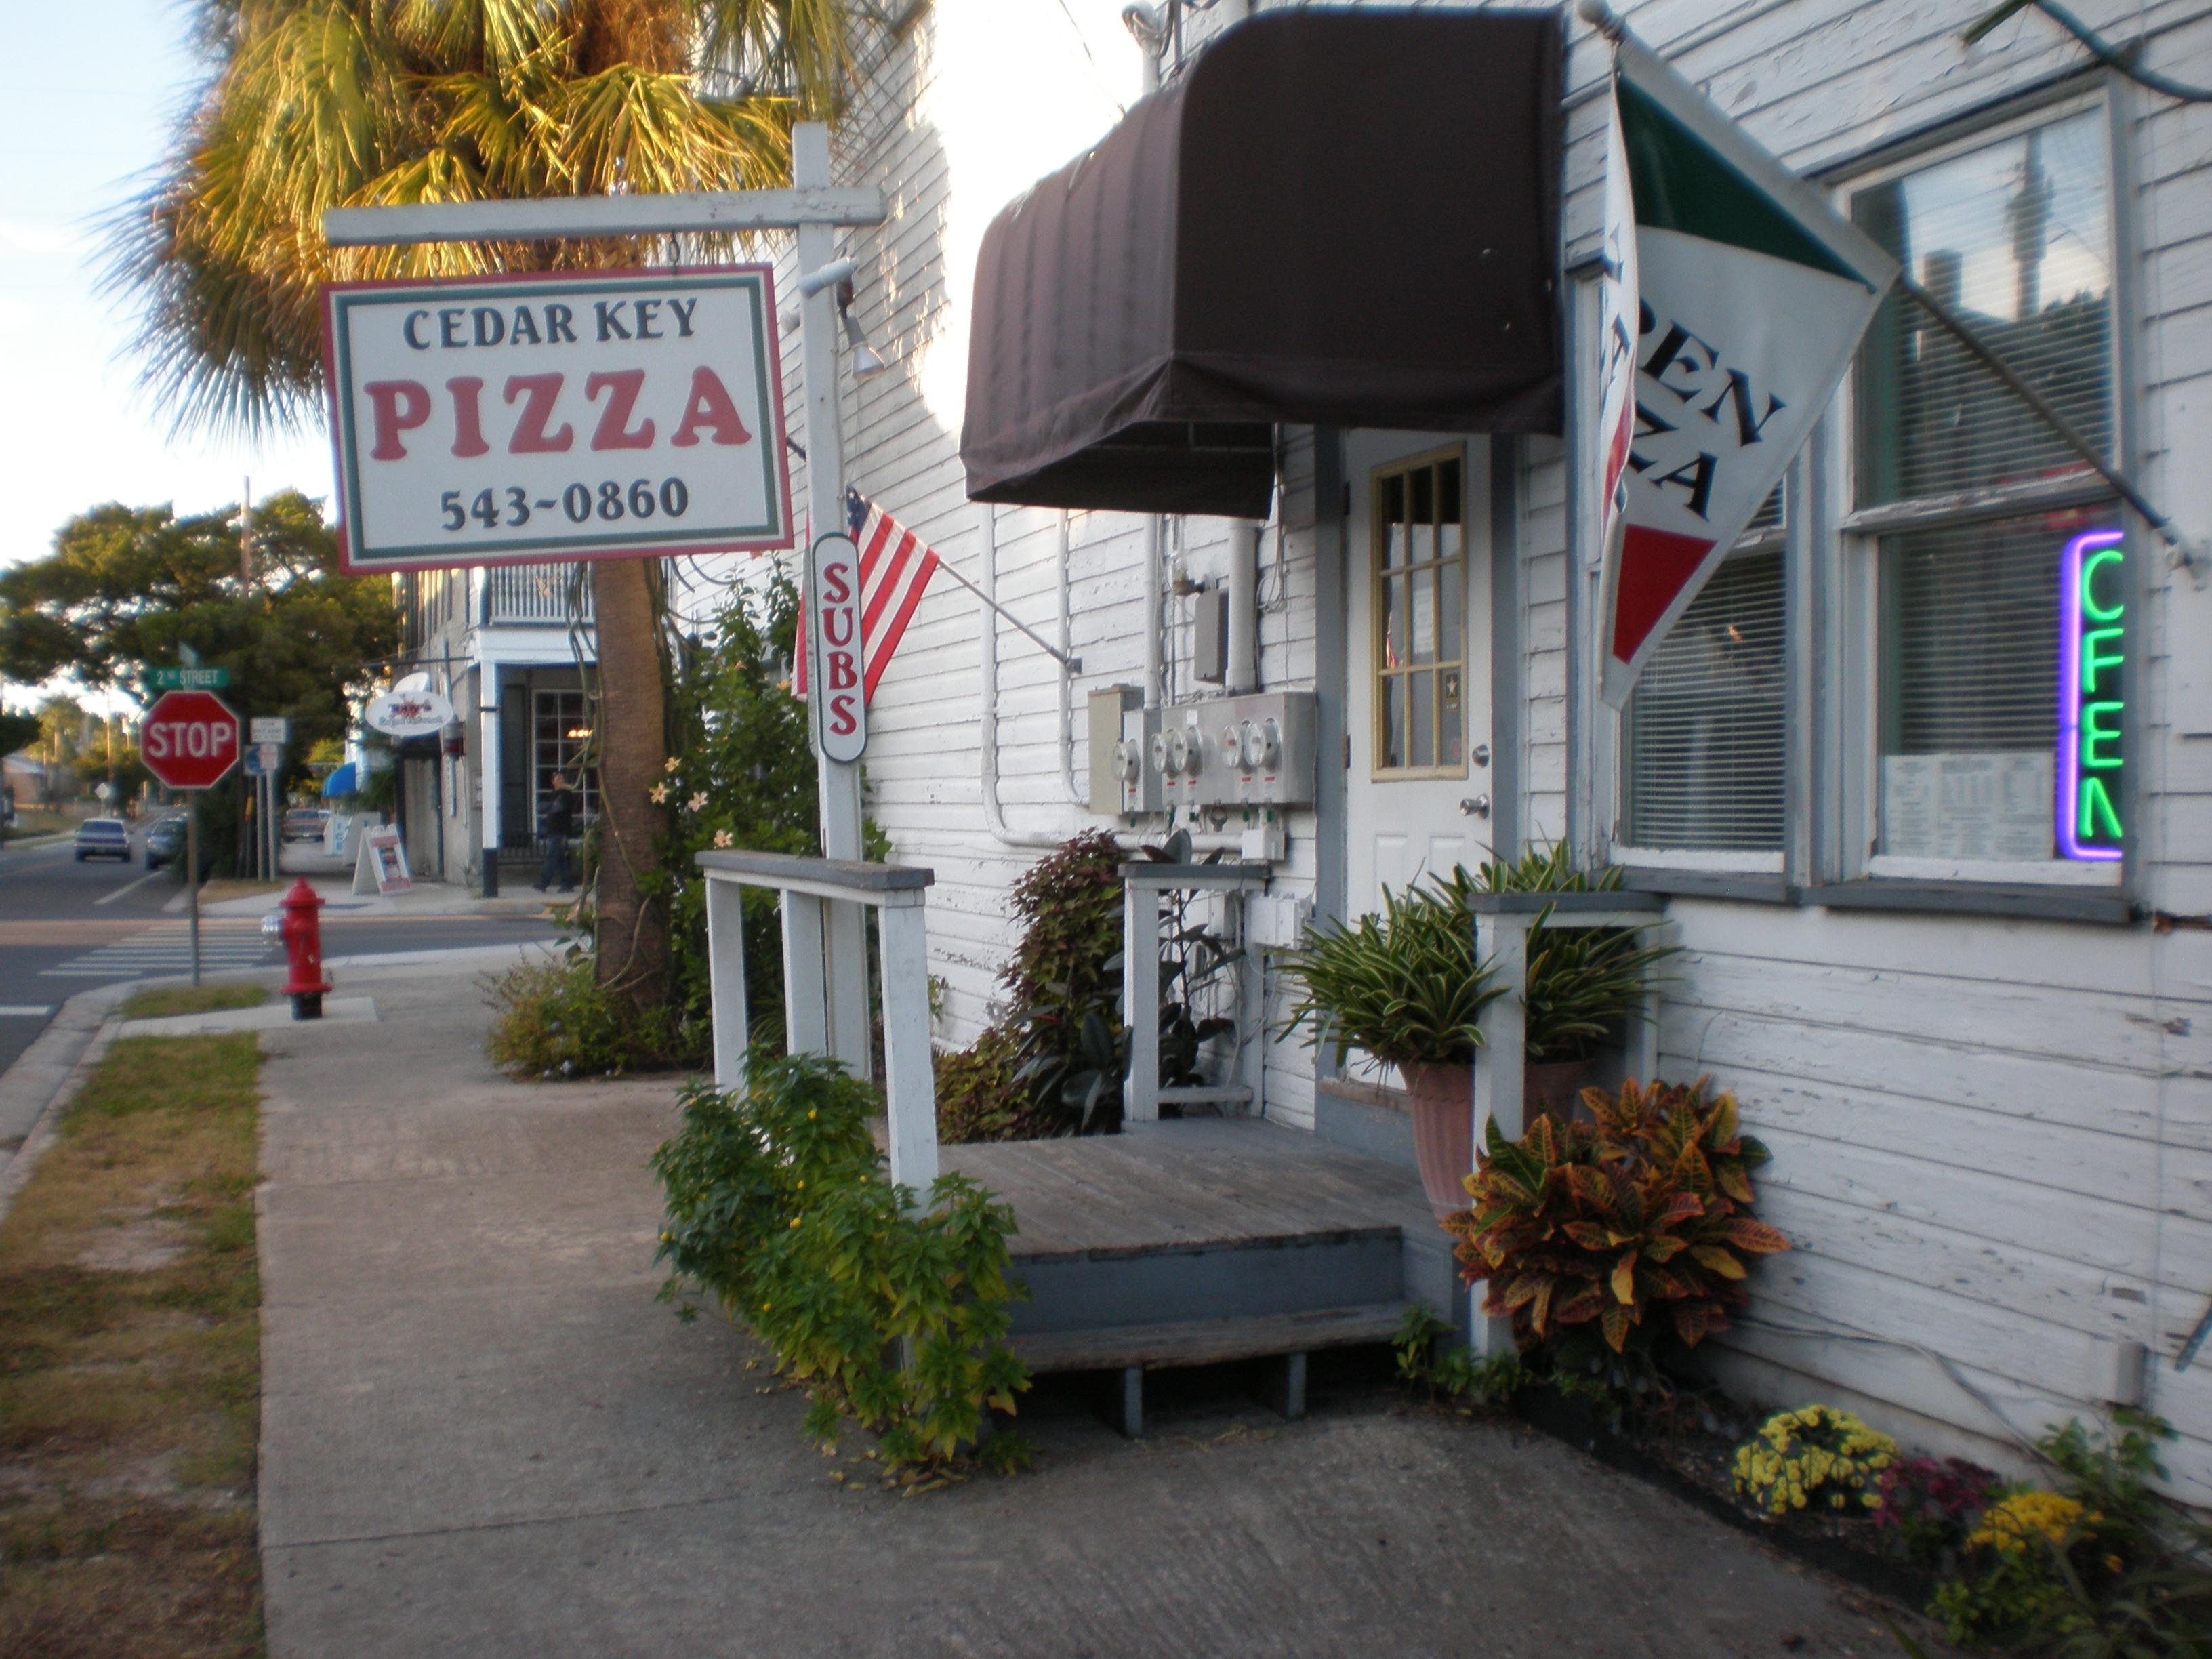 Cedar Key Pizza, Cedar Key FL